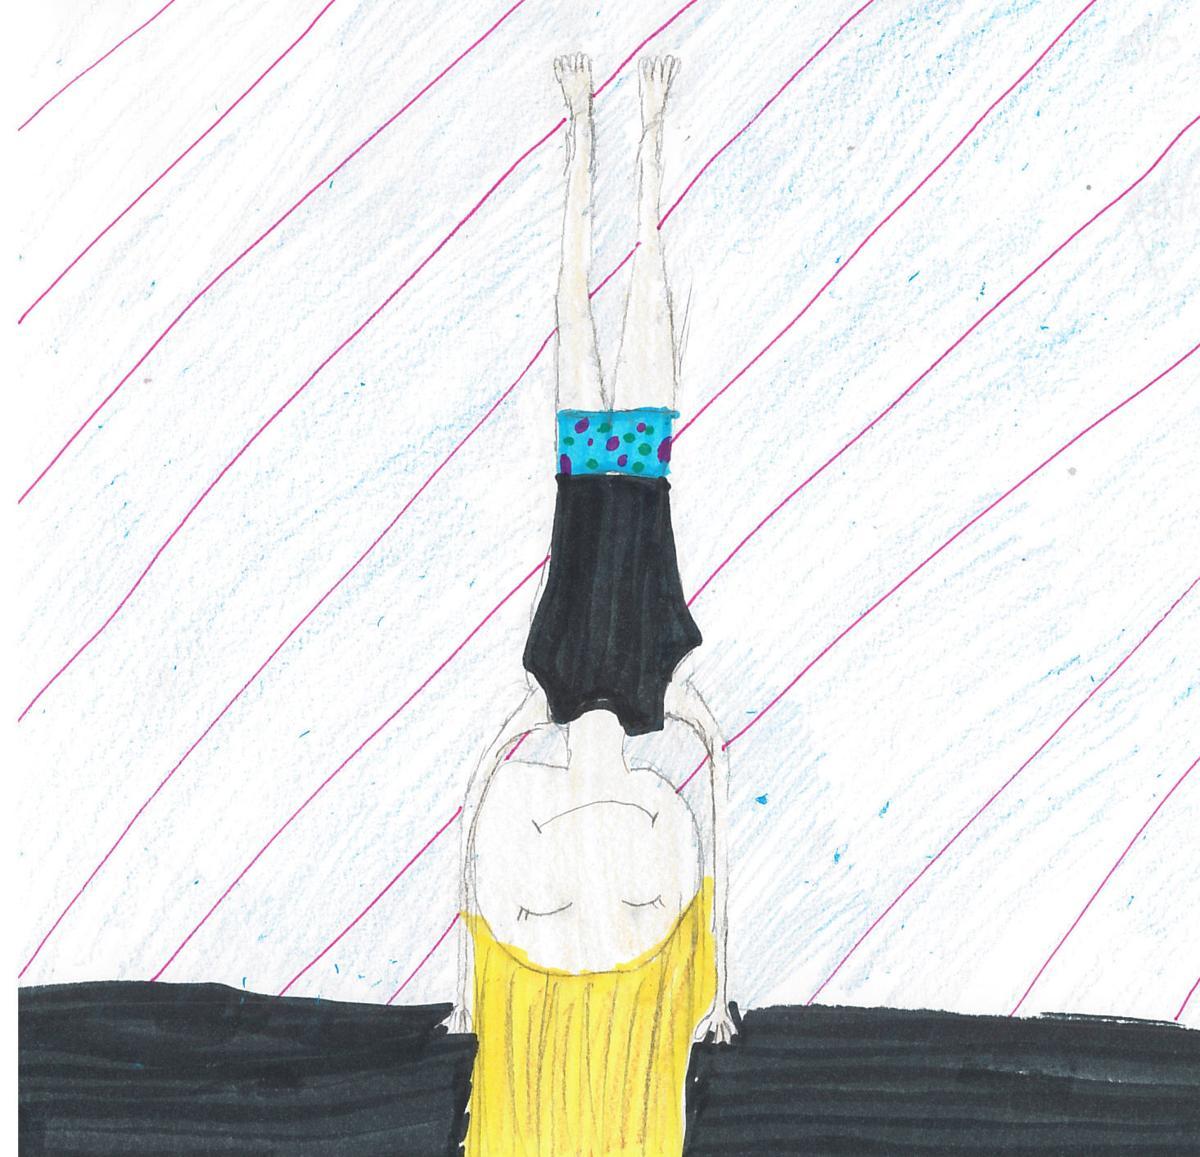 032518-blm-lif-flying-ratliff